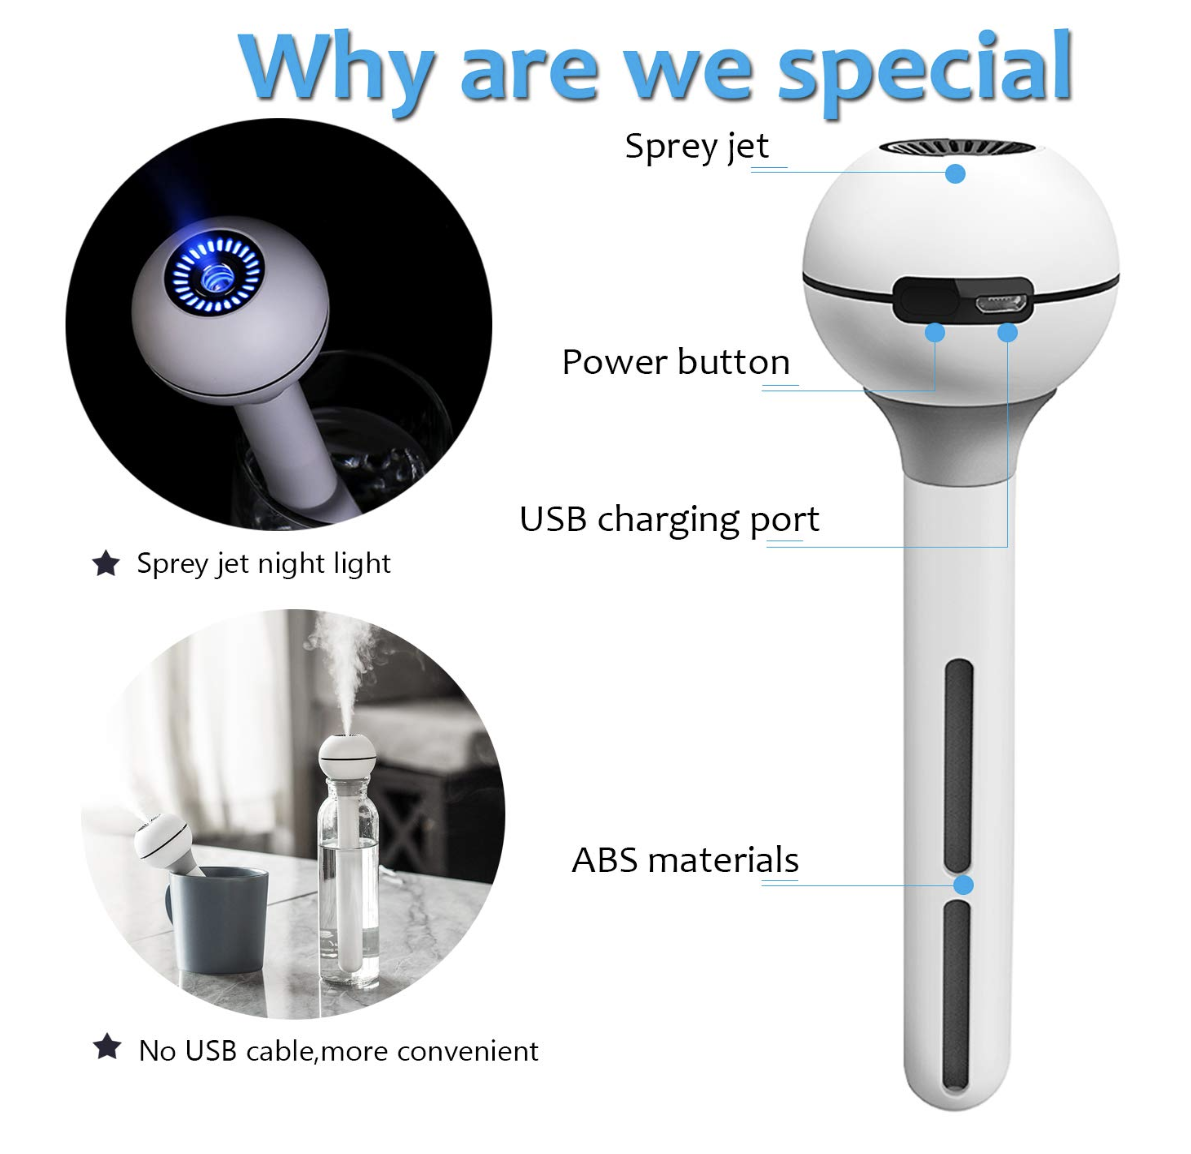 Aveloki USB Humidifier with Built-In Battery specs